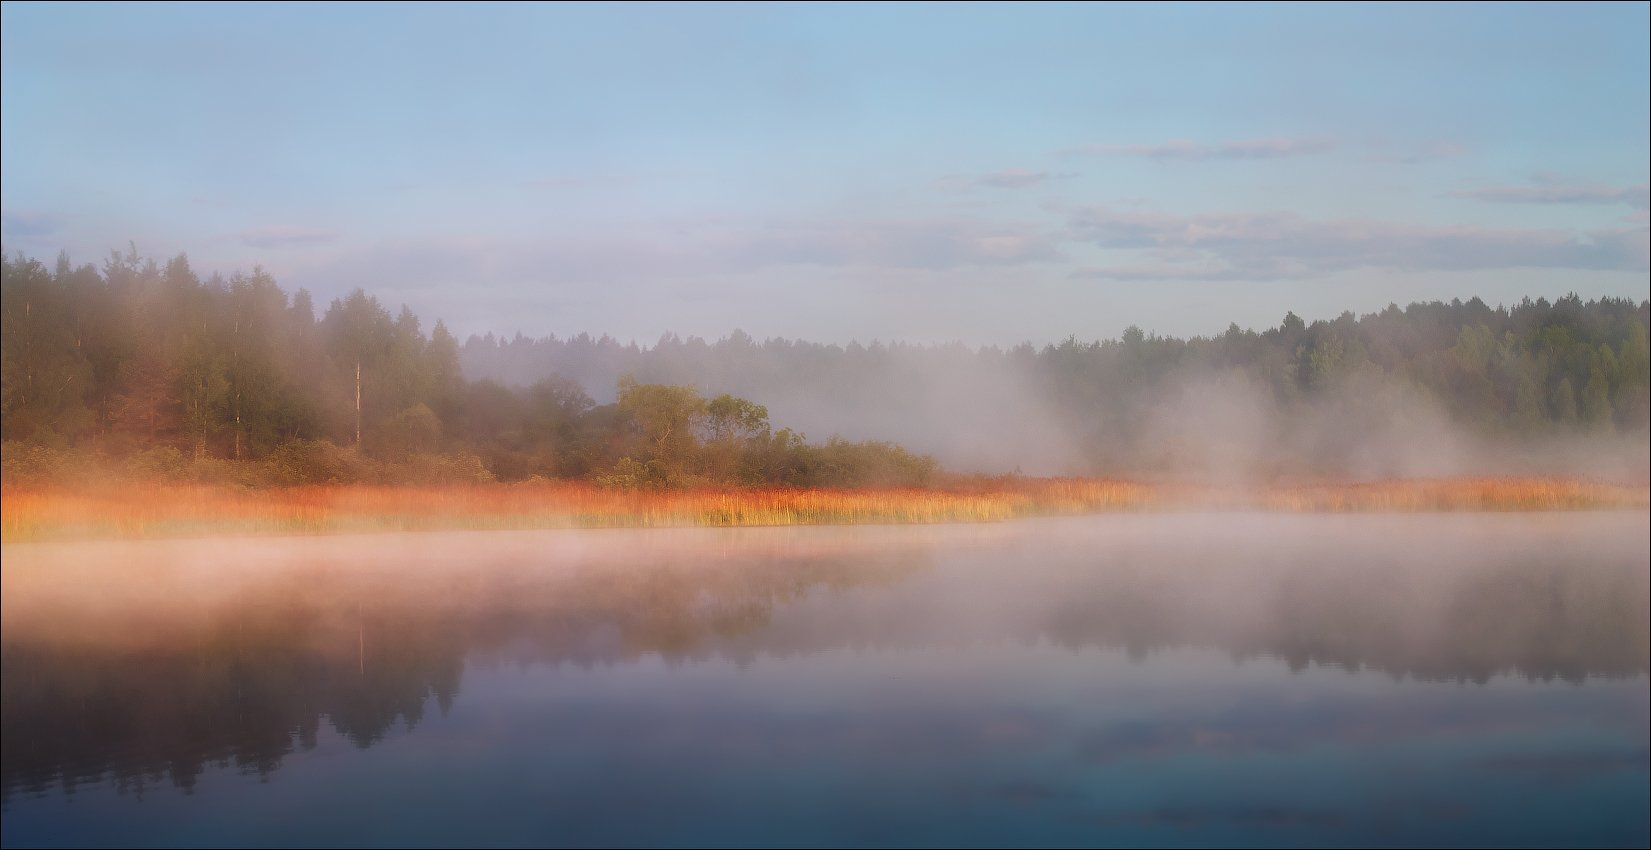 река, рассвет, дымка, туман,, Сергей Шабуневич